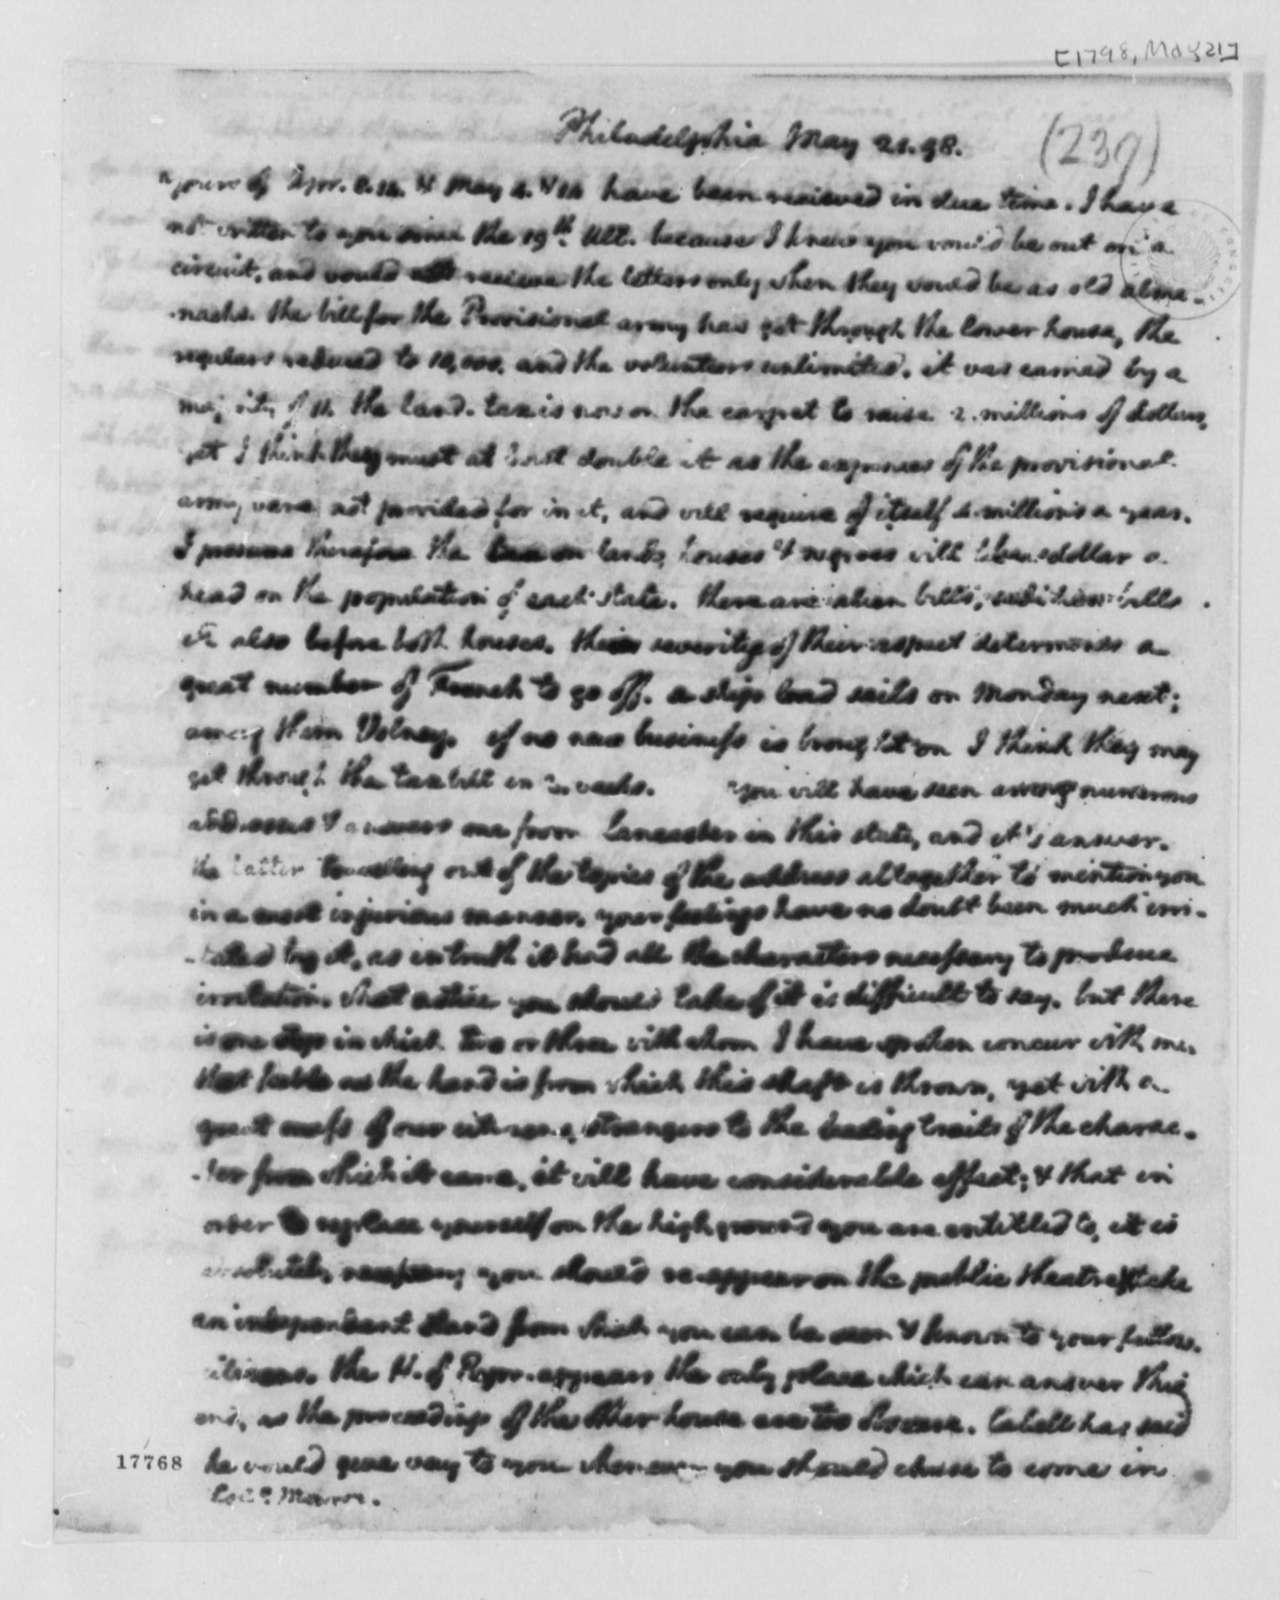 Thomas Jefferson to James Monroe, May 21, 1798